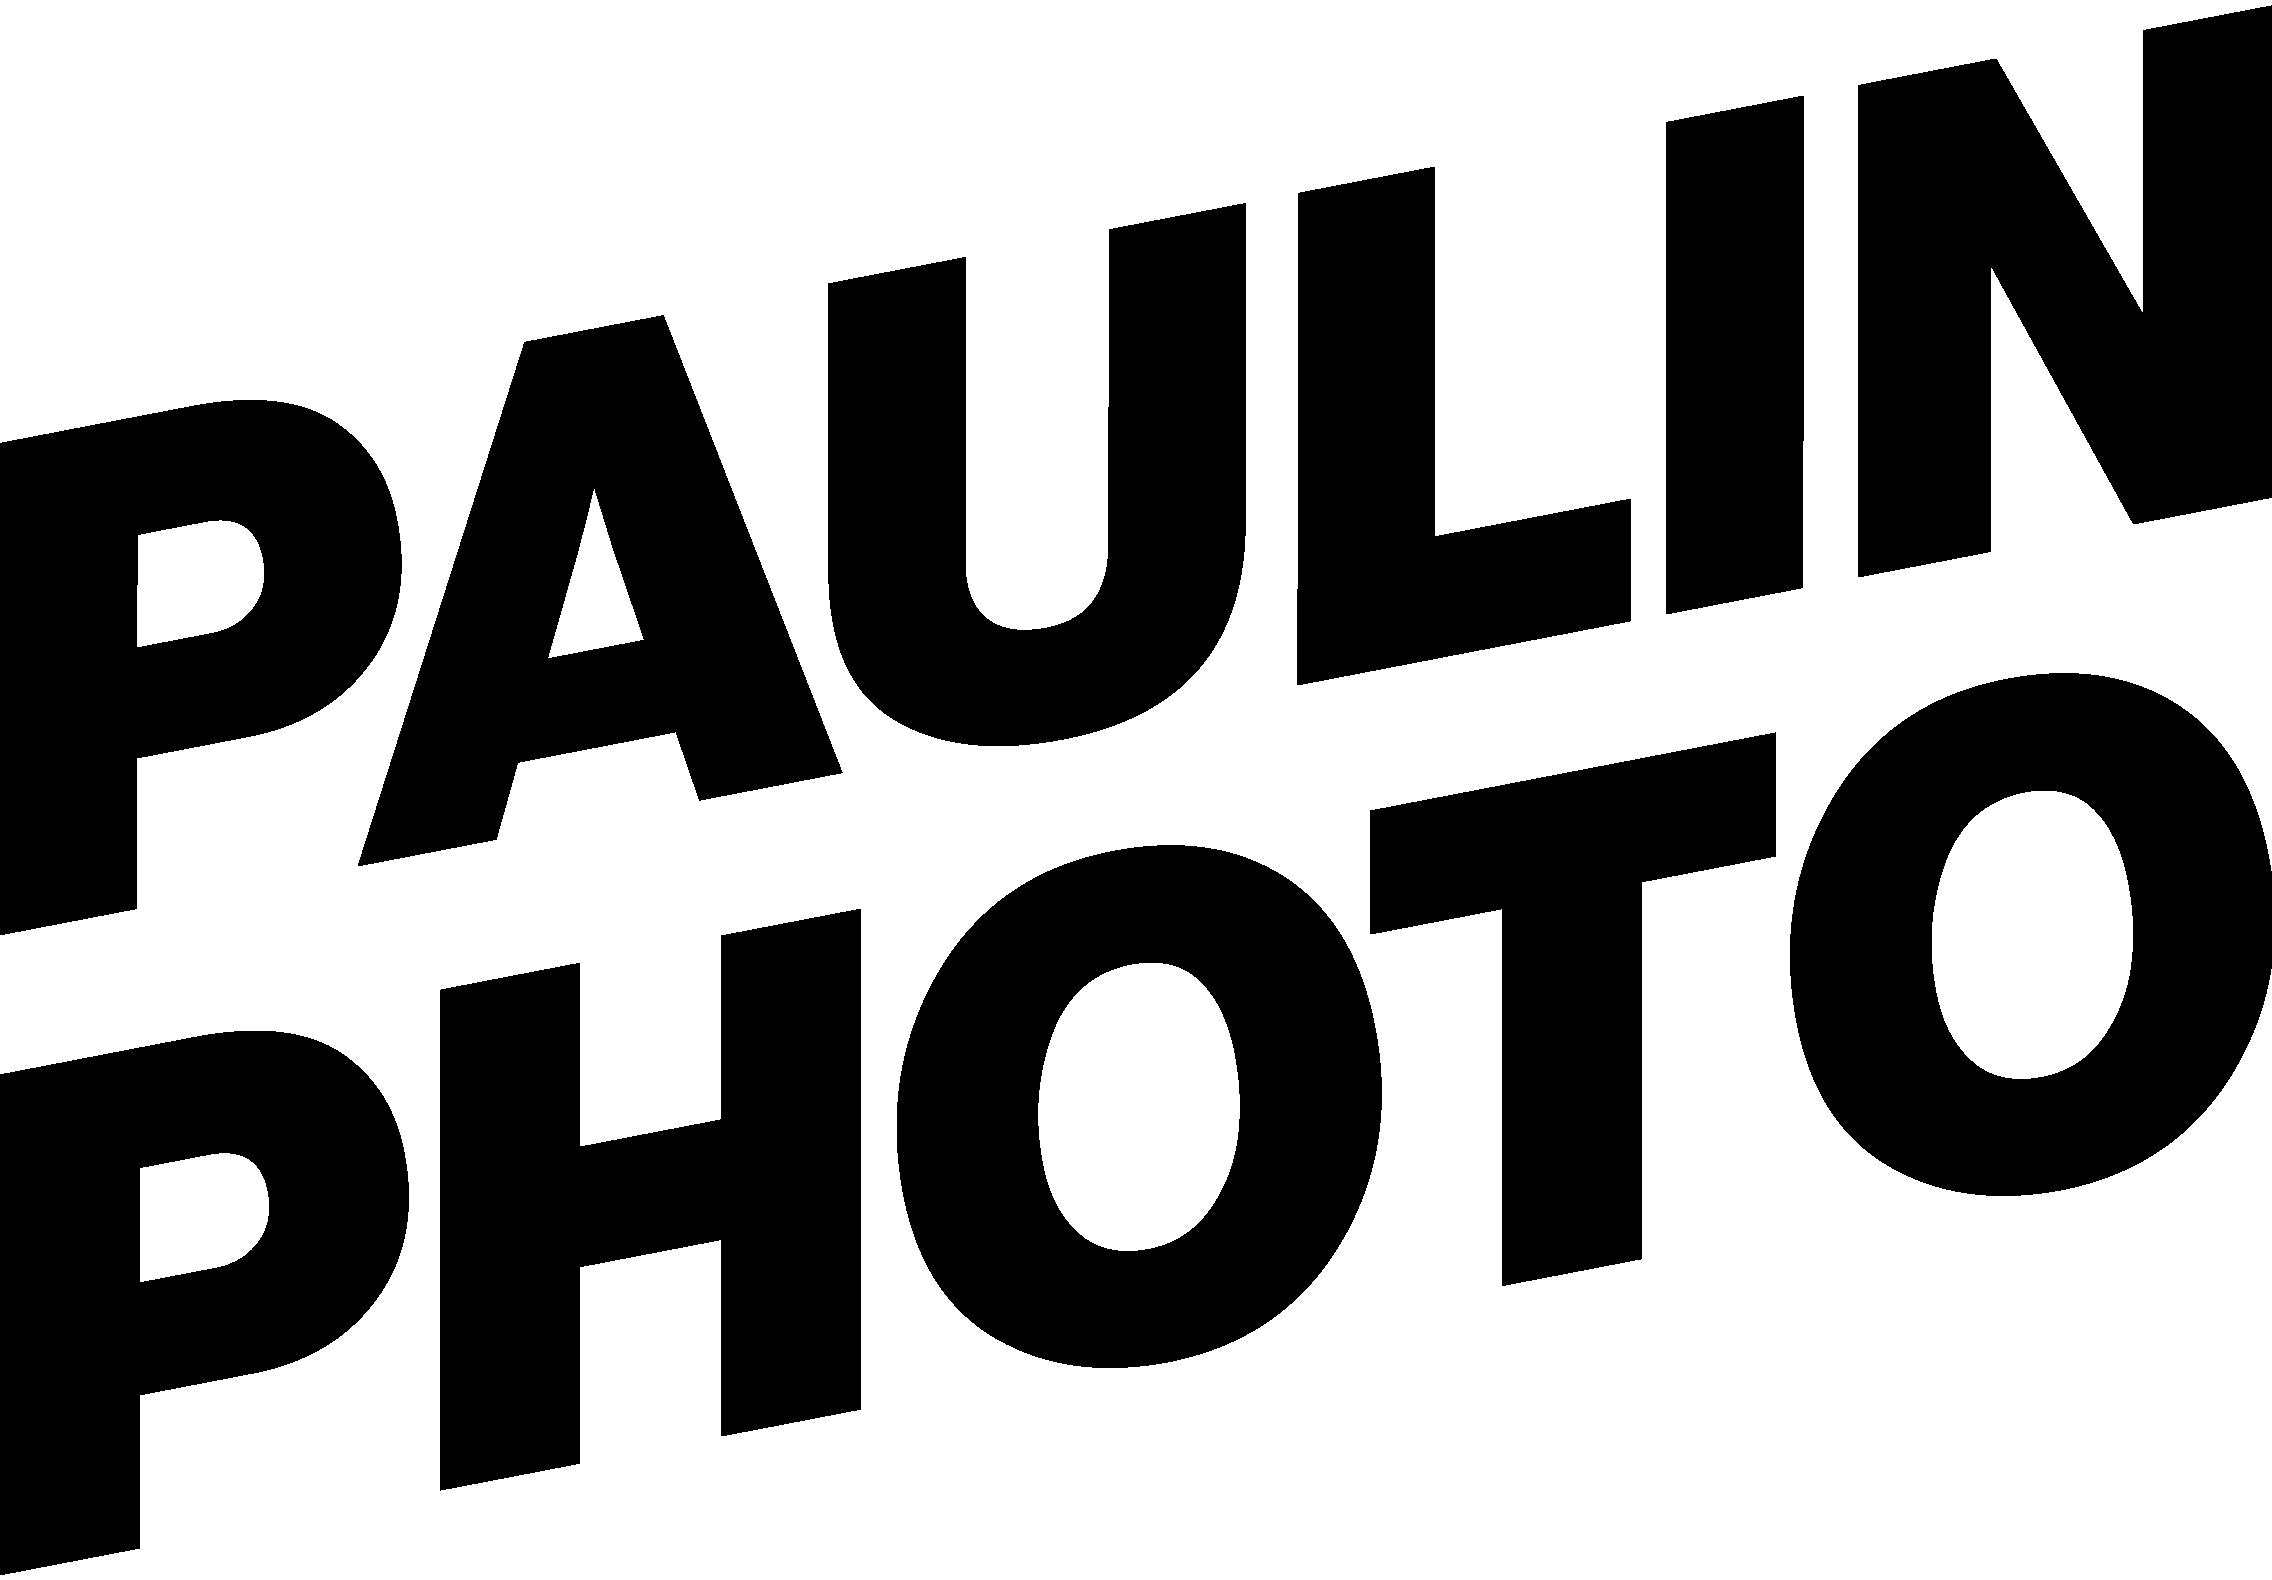 Paulin Giret